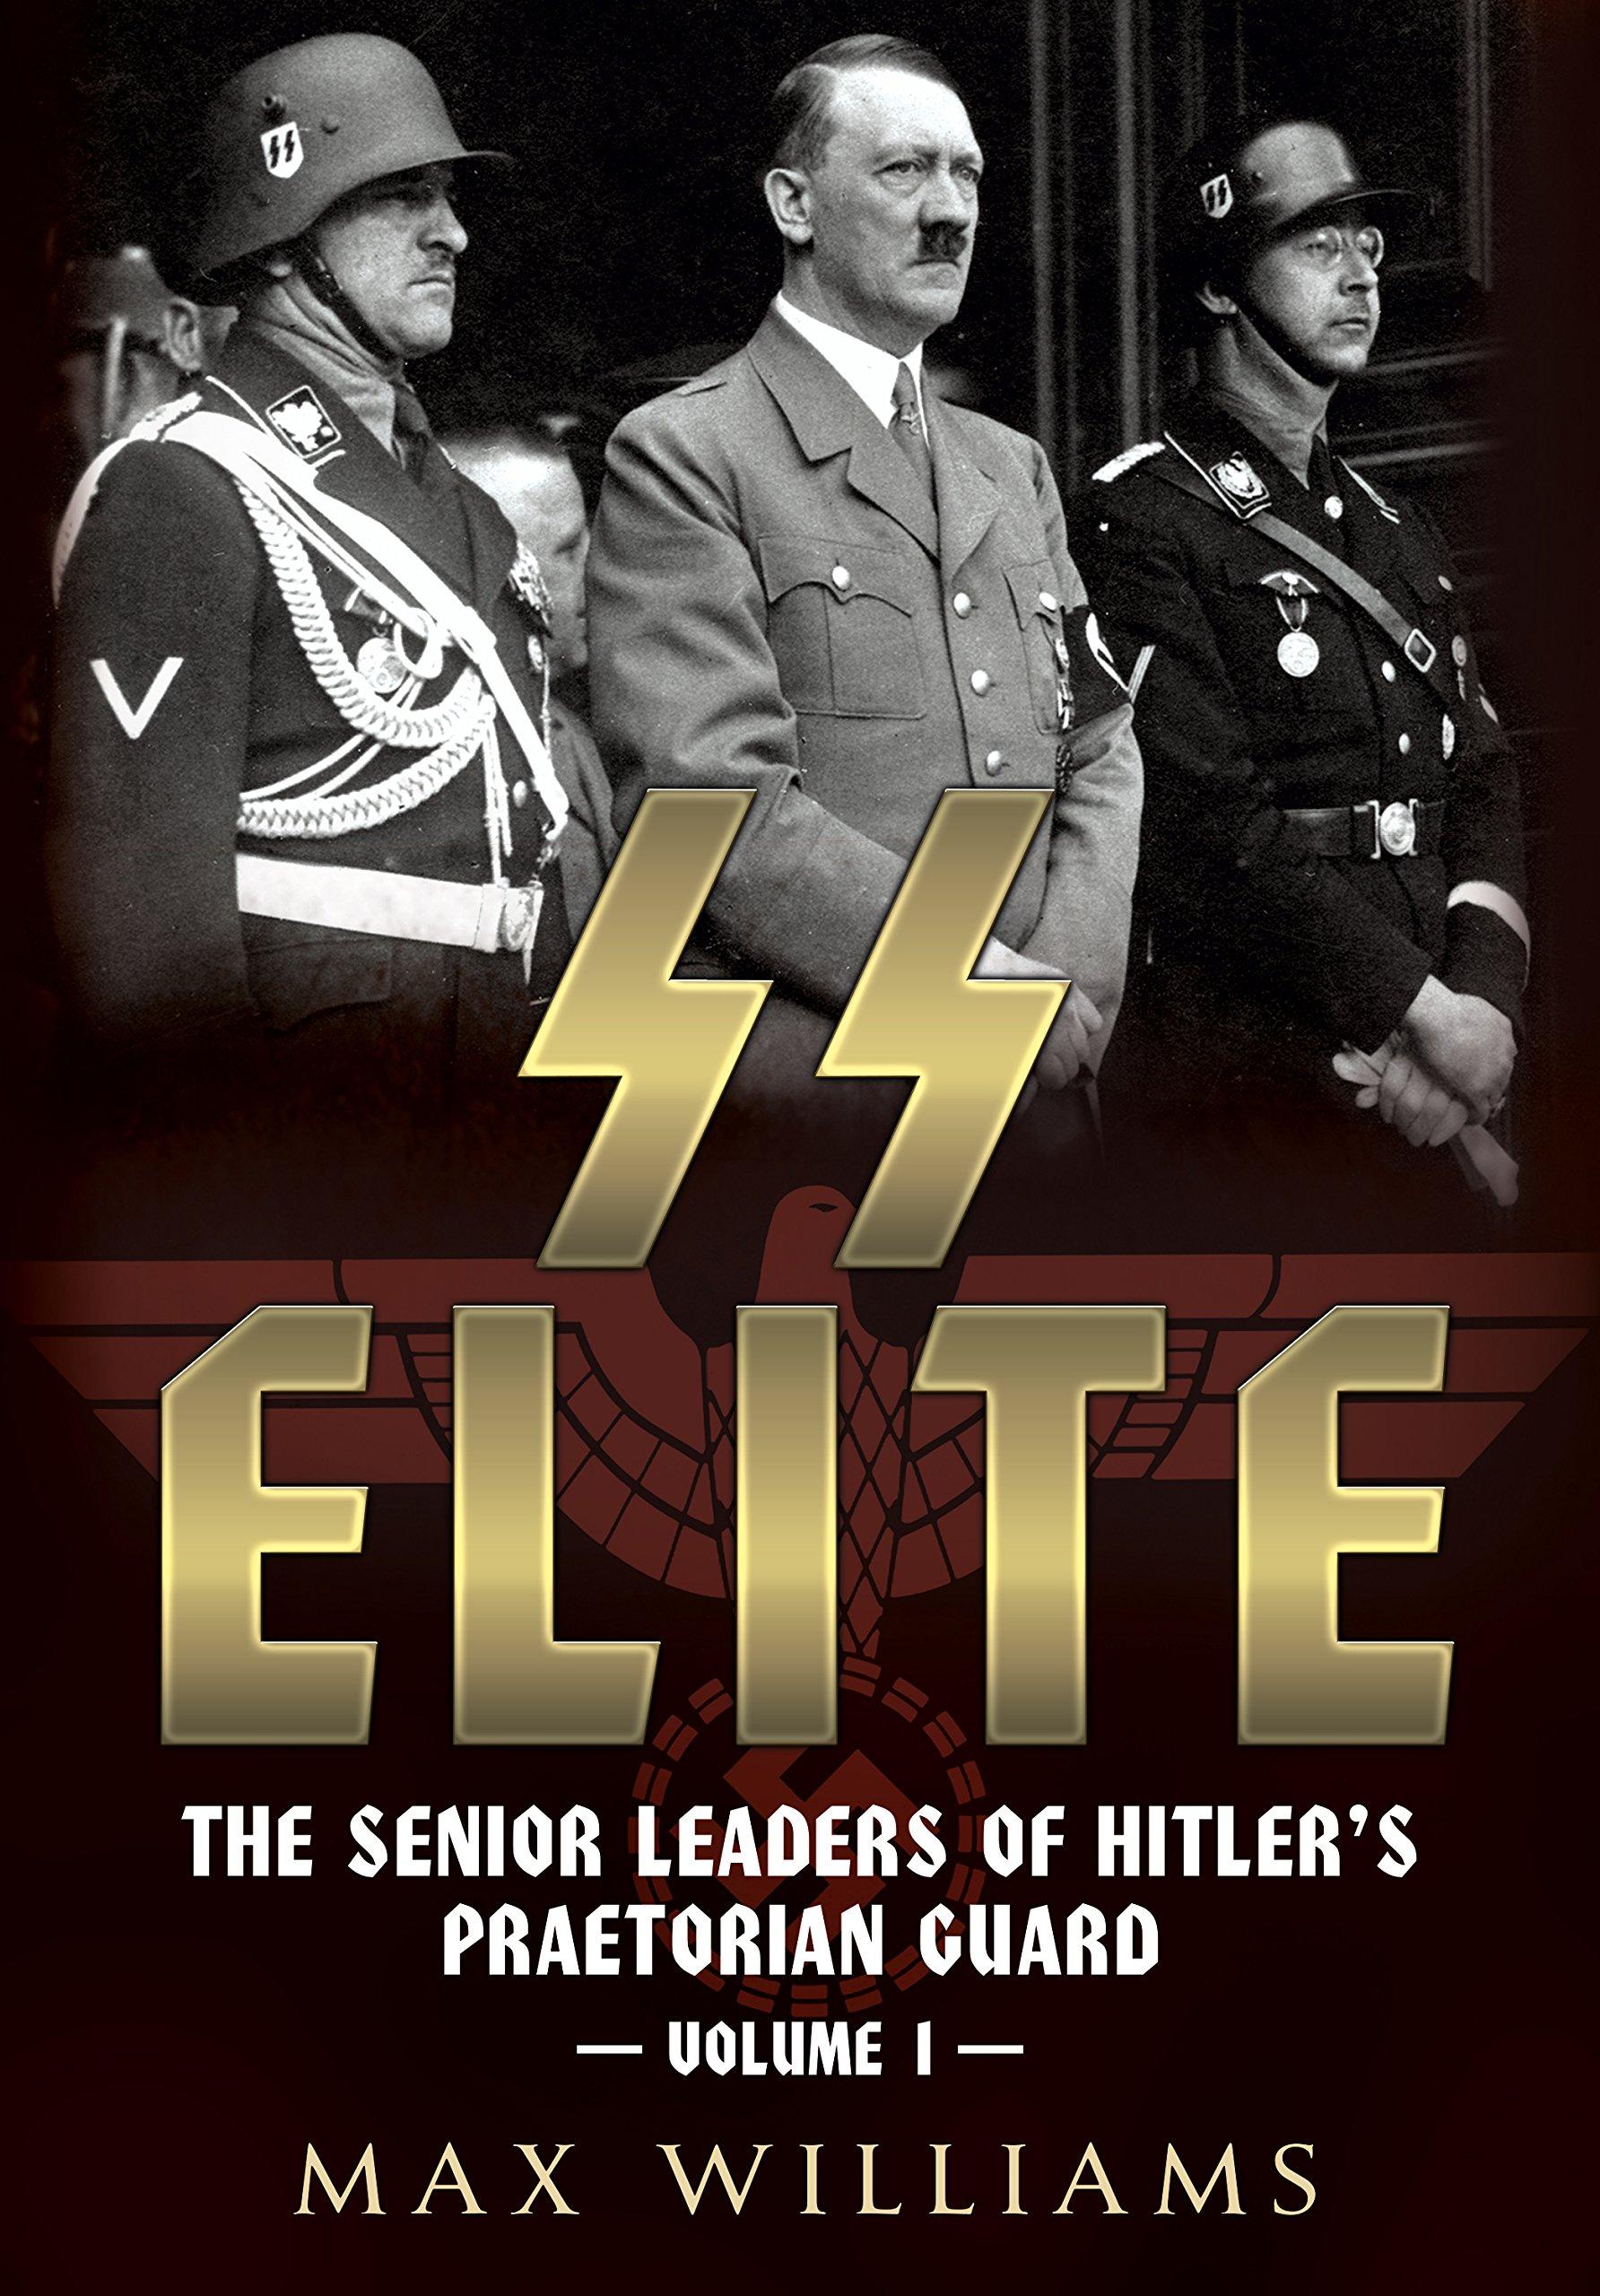 Download SS Elite. Volume 1: A to J: The Senior Leaders of Hitler's Praetorian Guard pdf